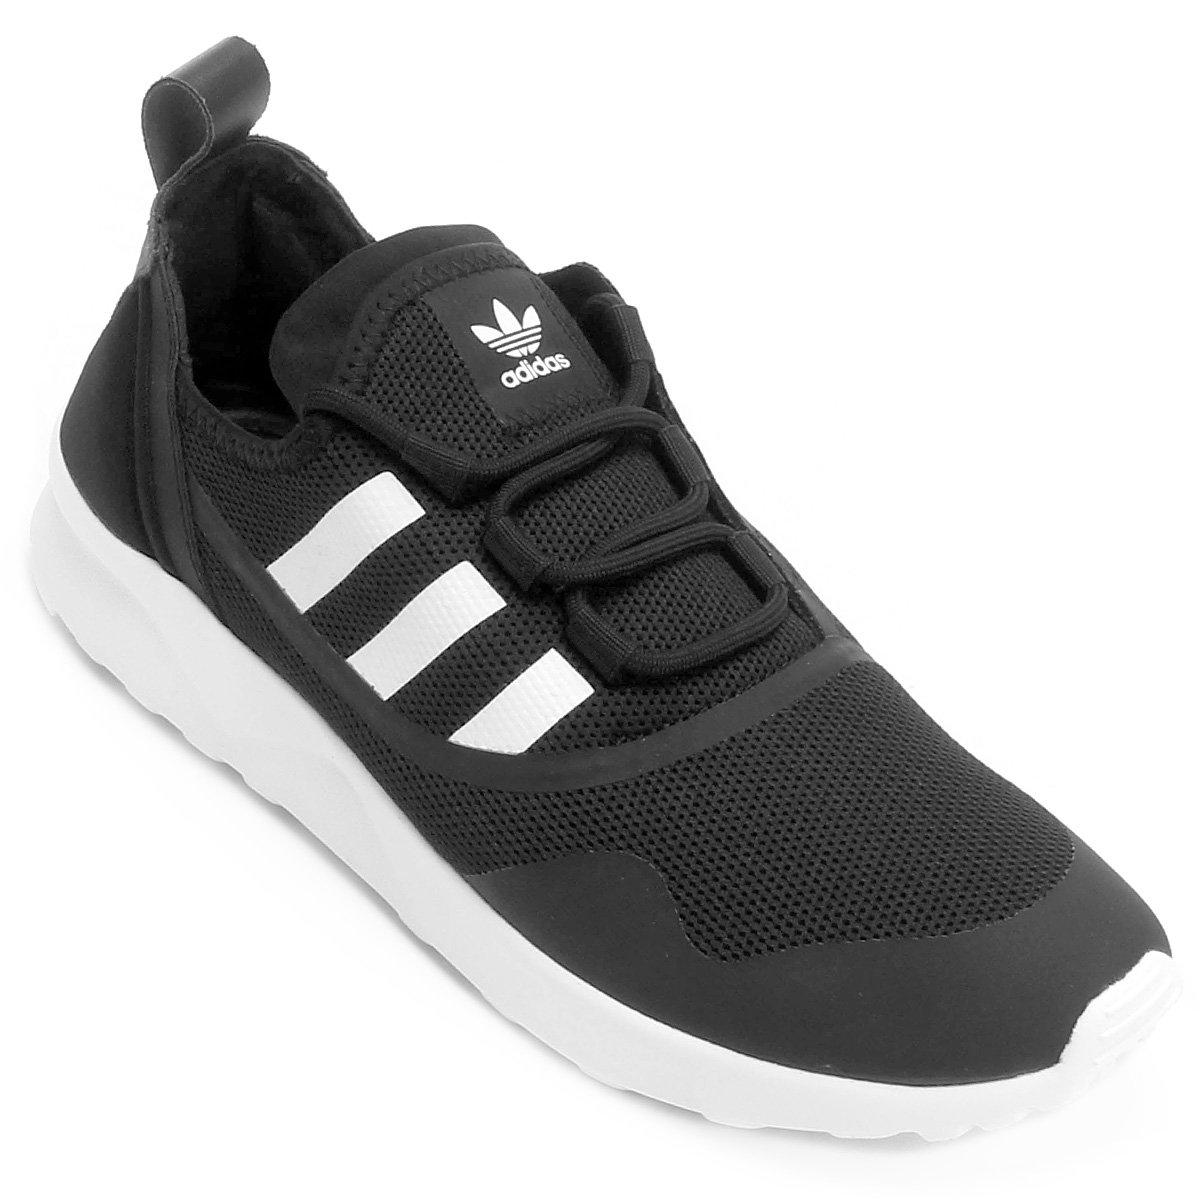 buy online 3fb48 1e6f1 ... promo code for tênis adidas zx flux adv virtue preto e branco c8eec  0d8d9 ...